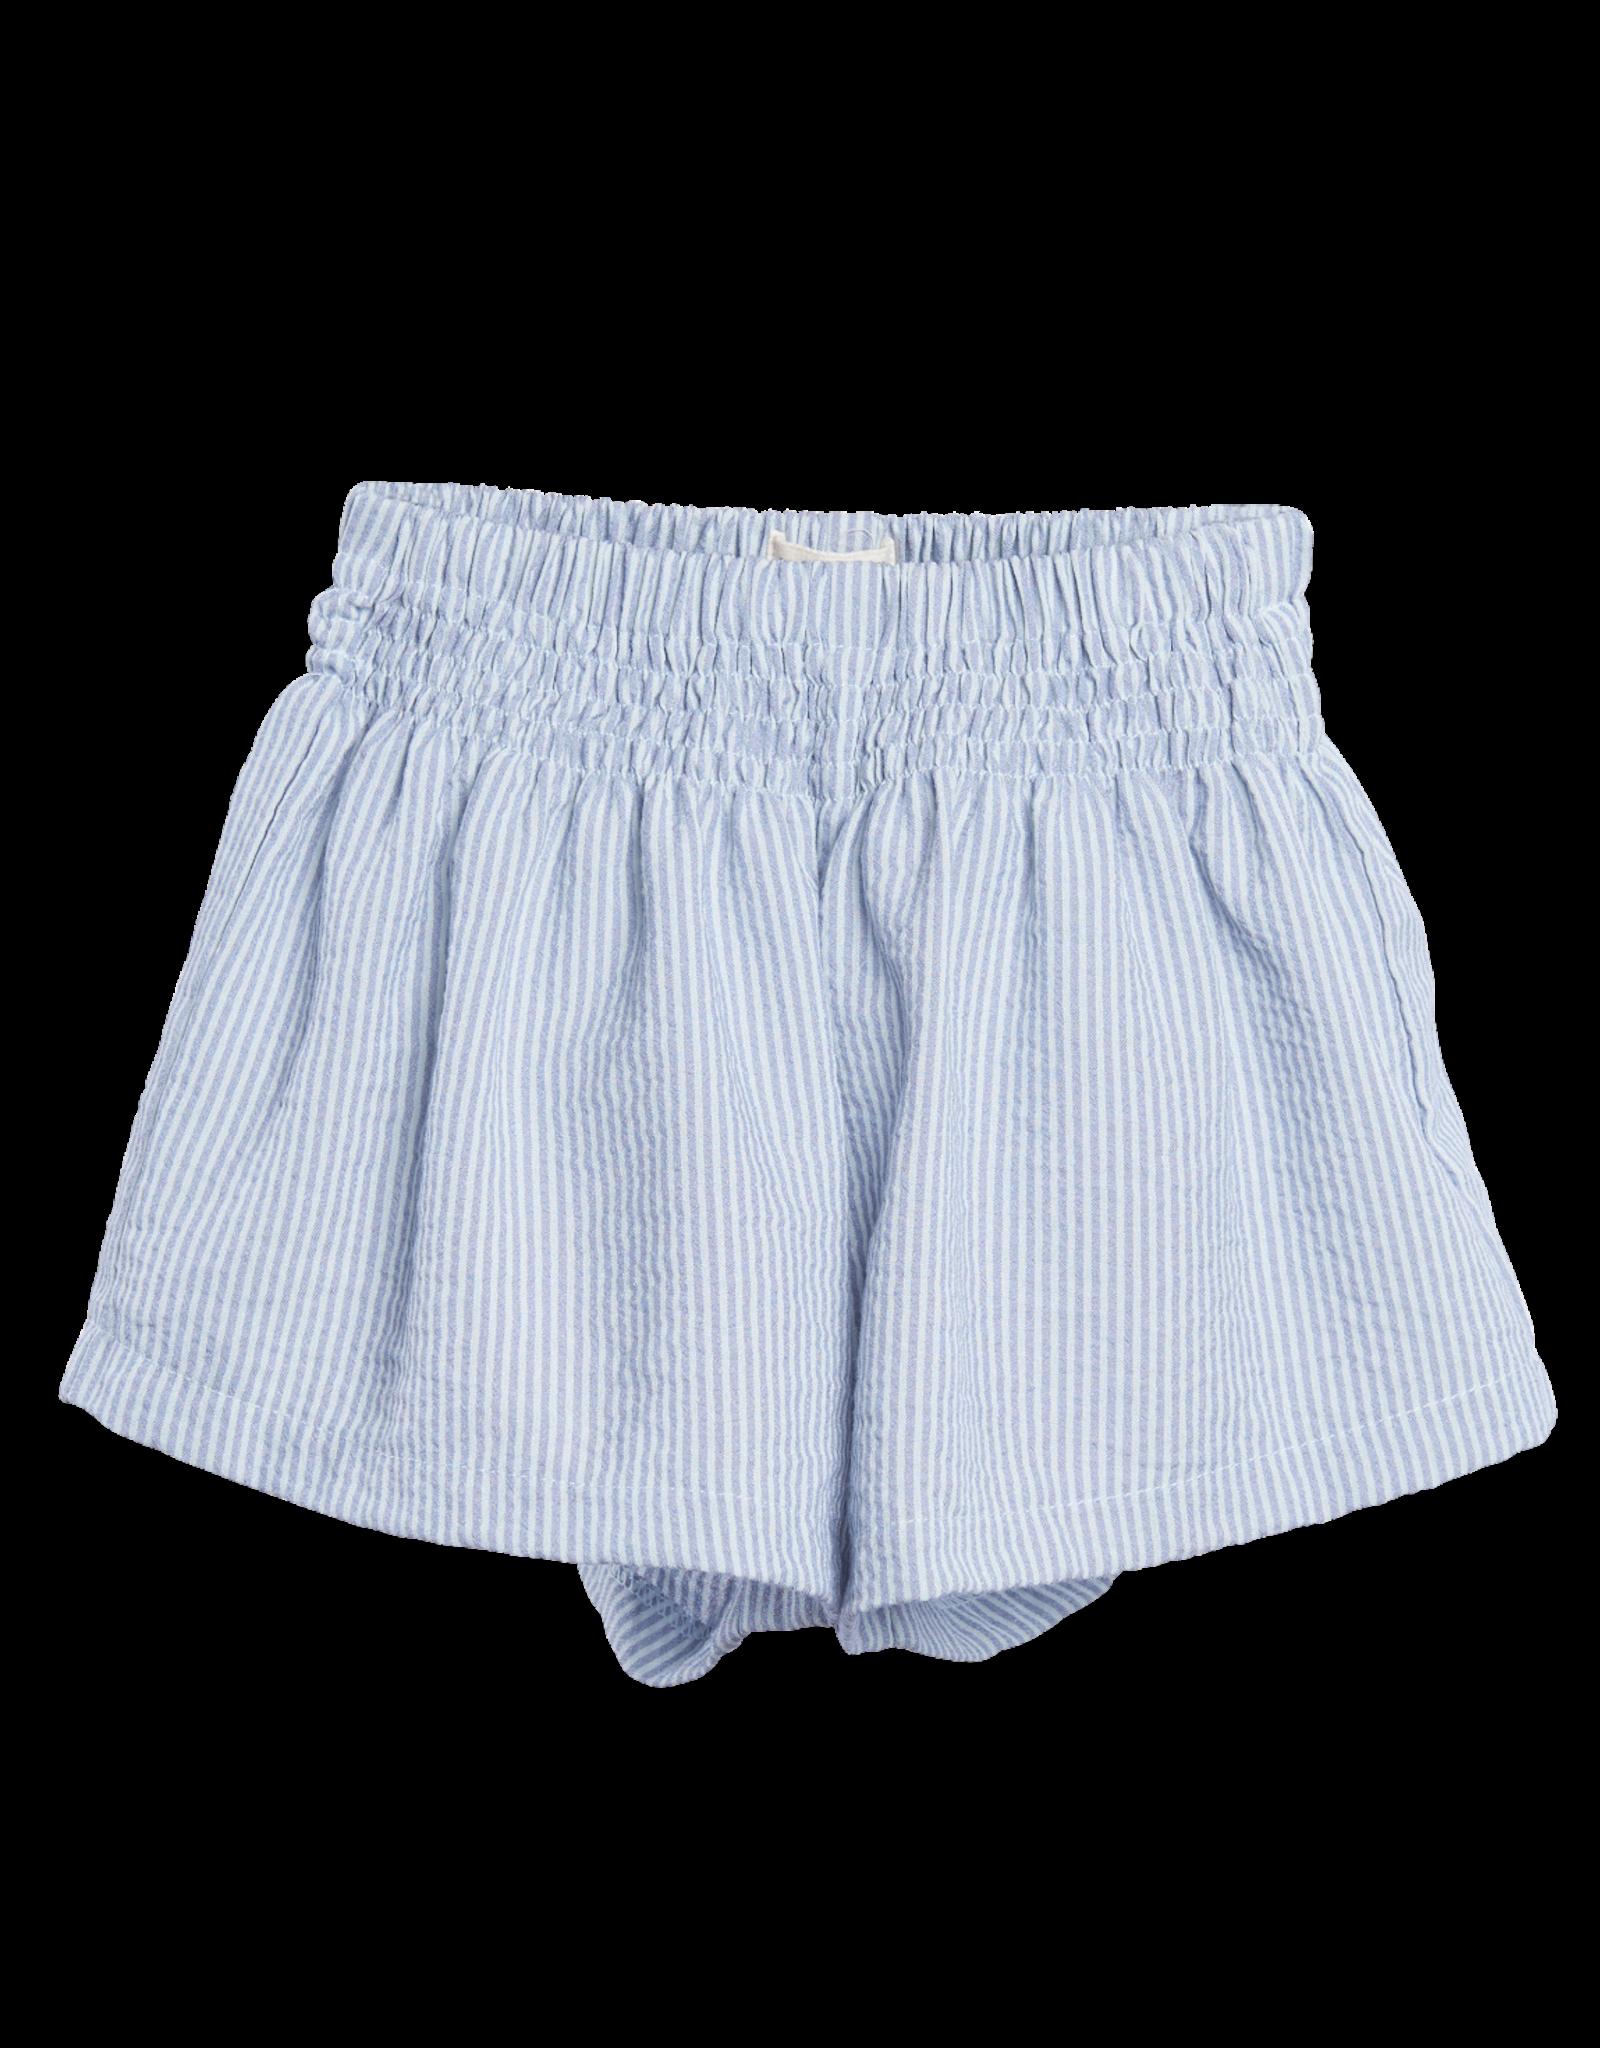 Siaomimi stripe shorts- stone